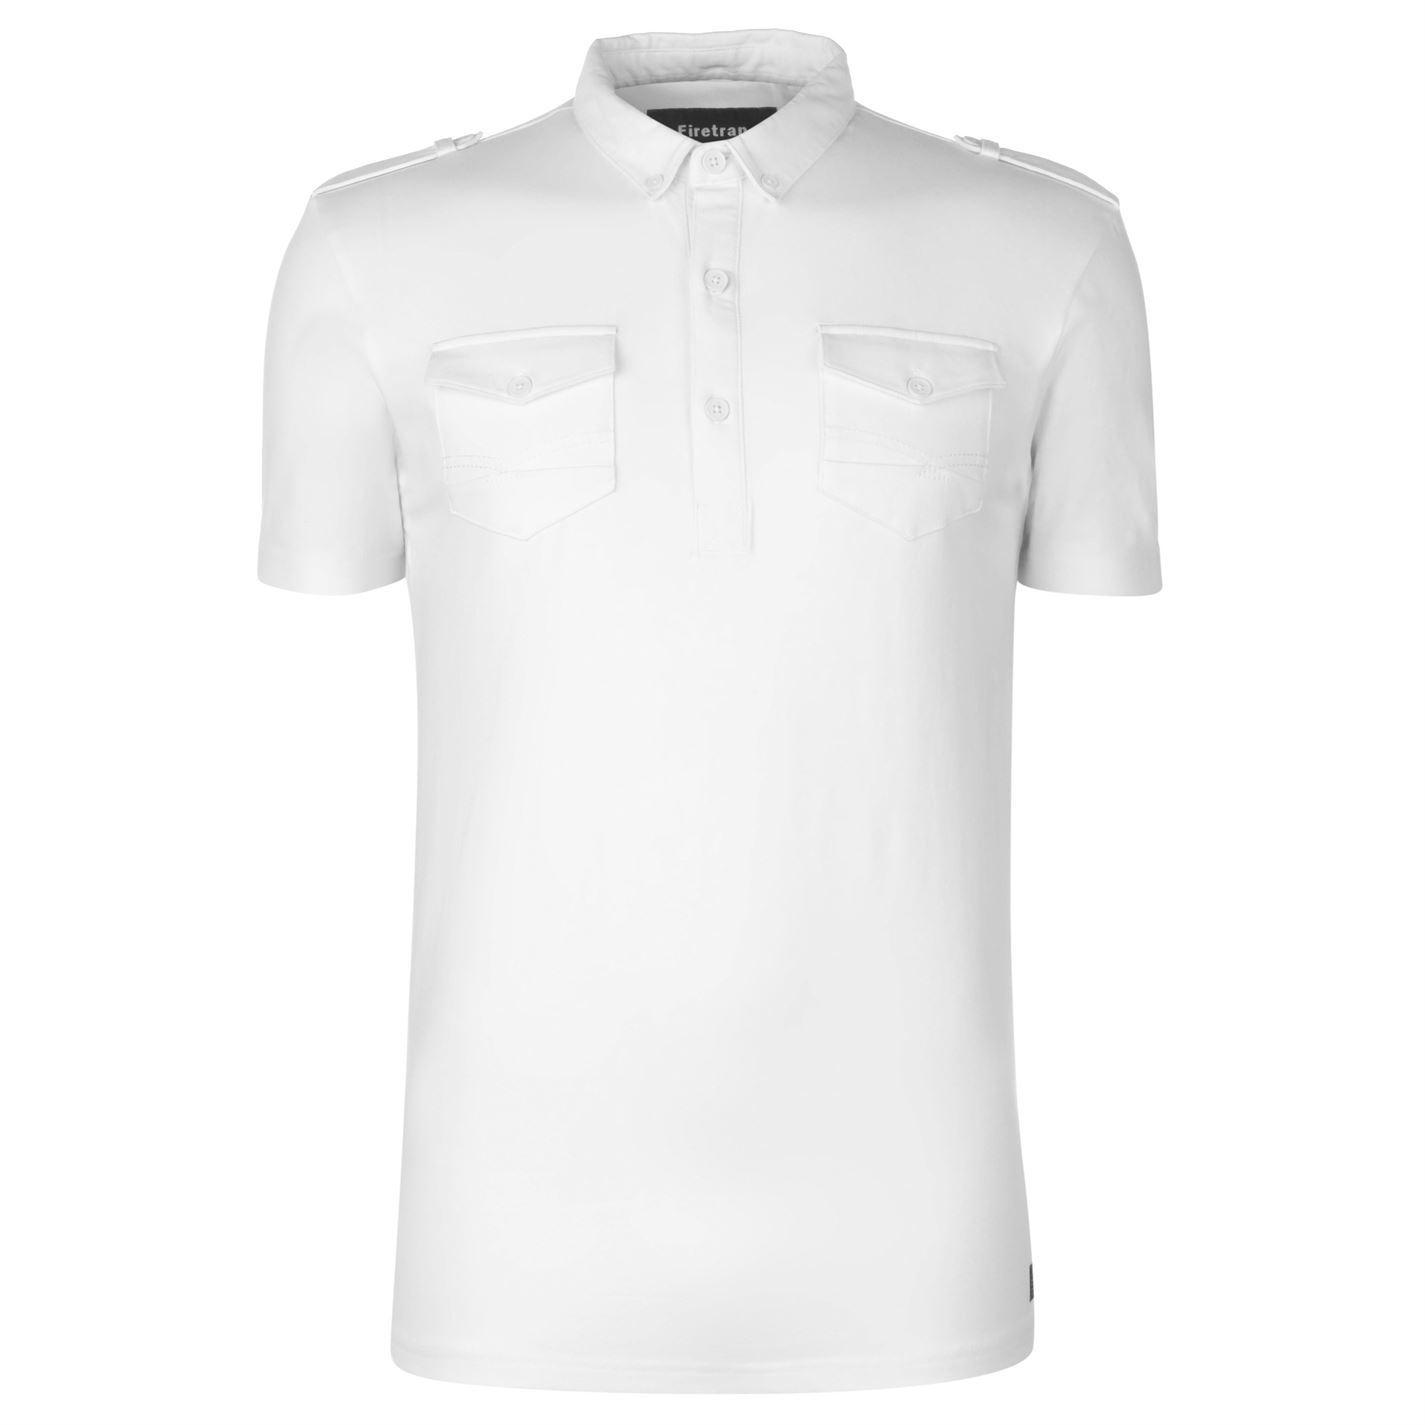 thumbnail 11 - Firetrap-Double-Pocket-Polo-Shirt-Mens-Collar-Top-Tee-Black-Medium